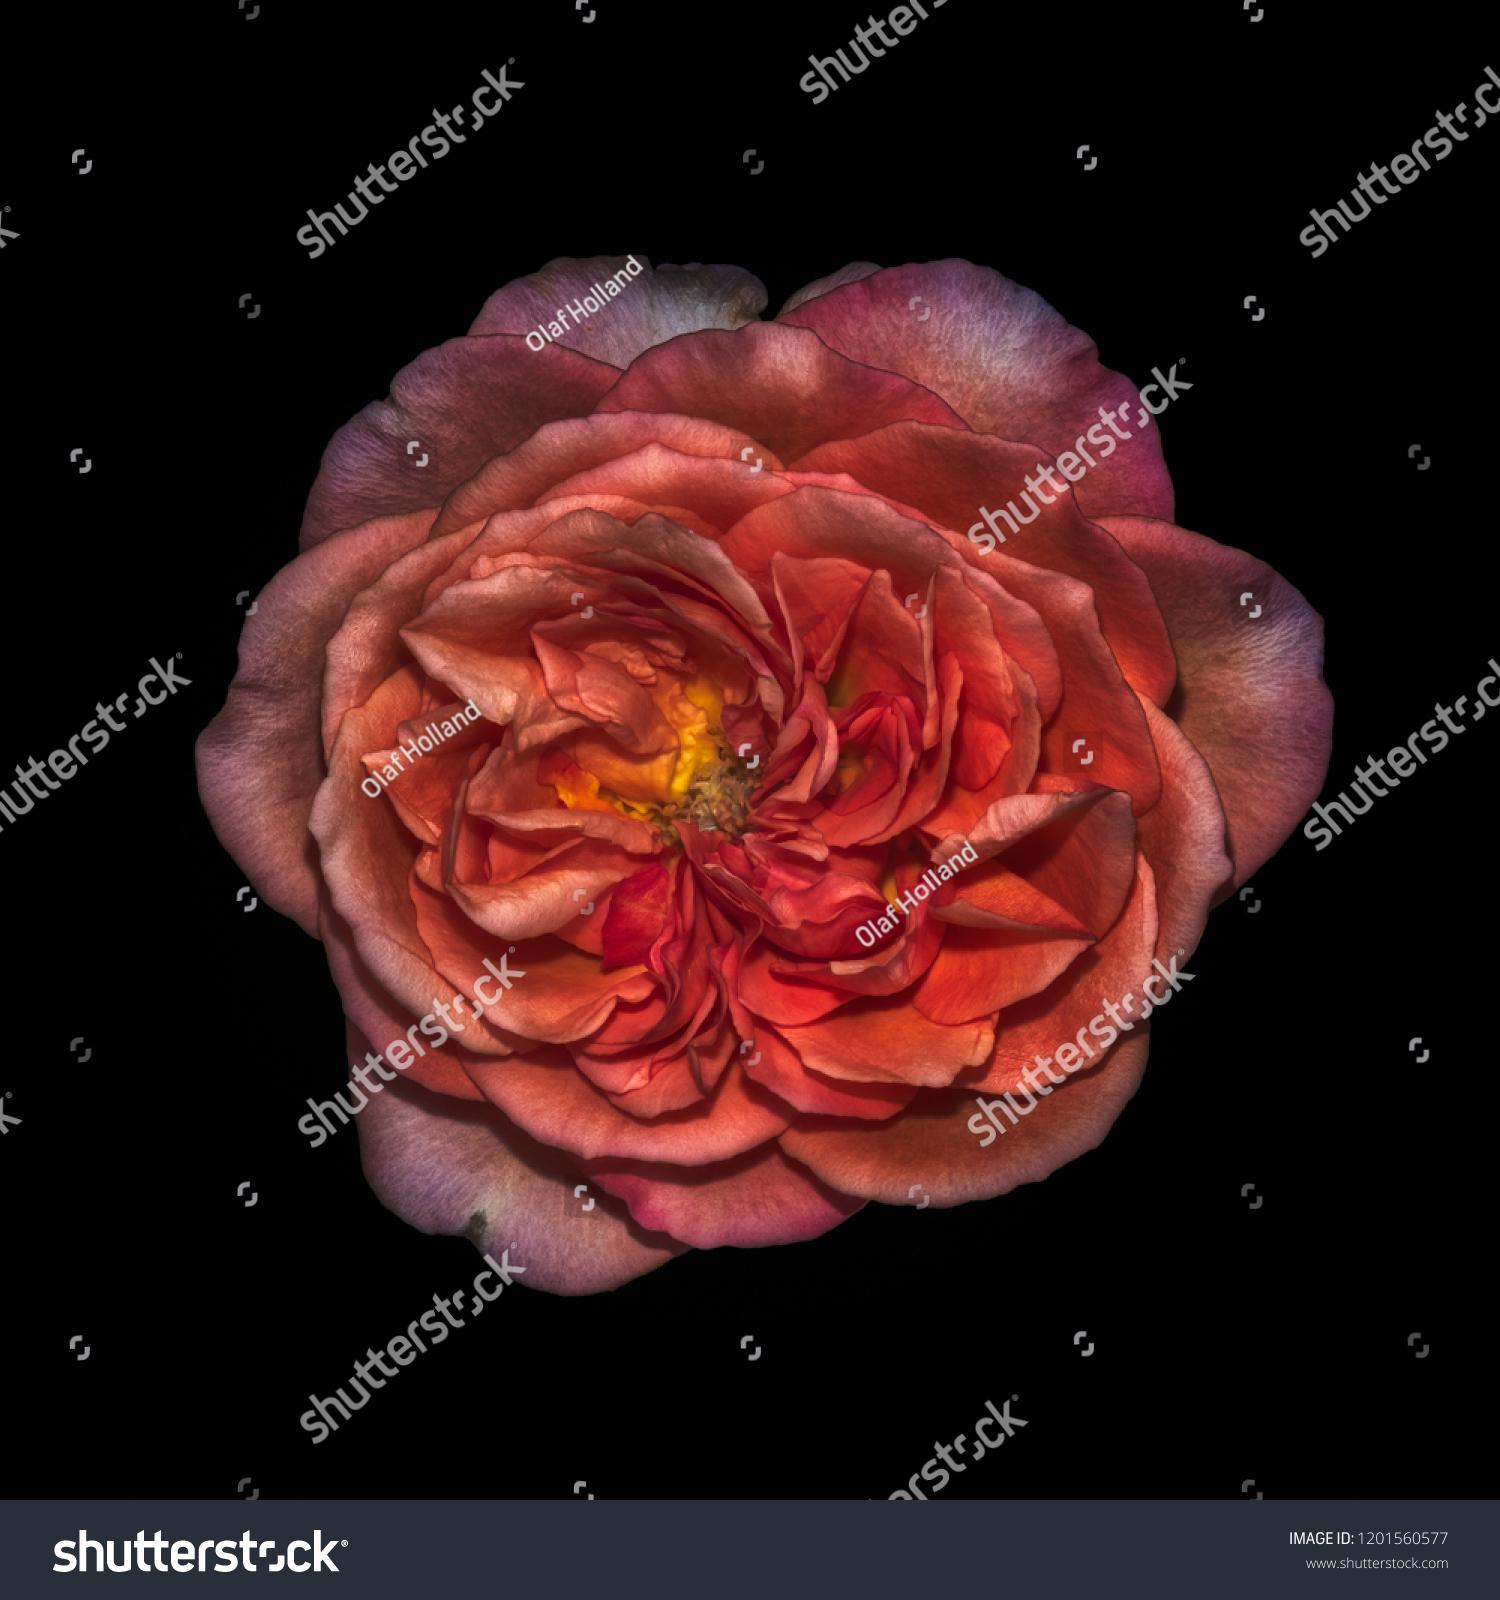 Dark Colorful Fine Art Still Life Stock Photo Edit Now 1201560577